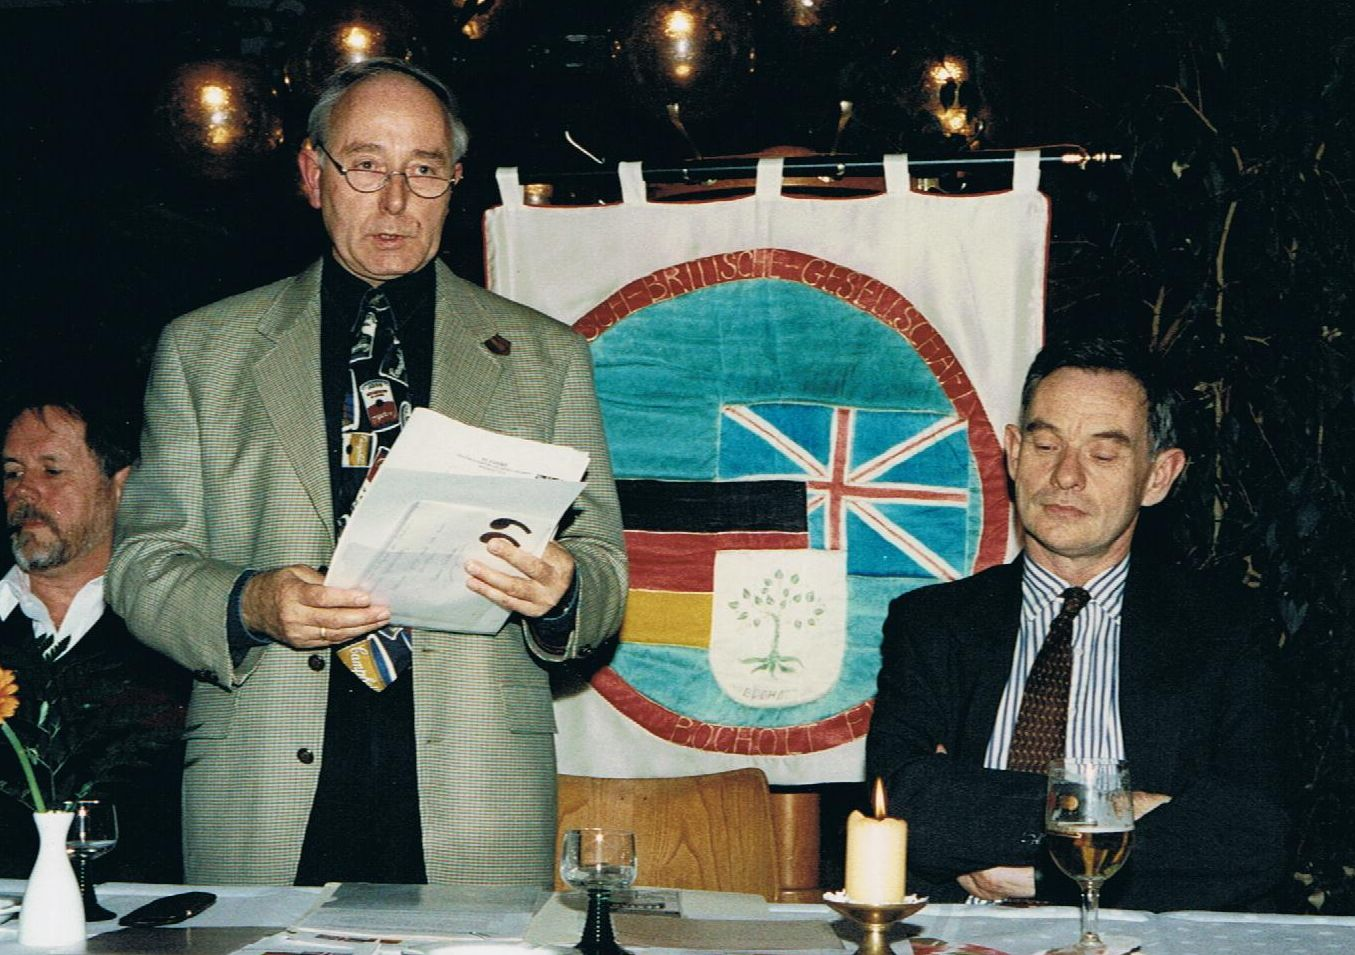 Konsul Donald Holder und Karl-Gerd Geßner, v. re.